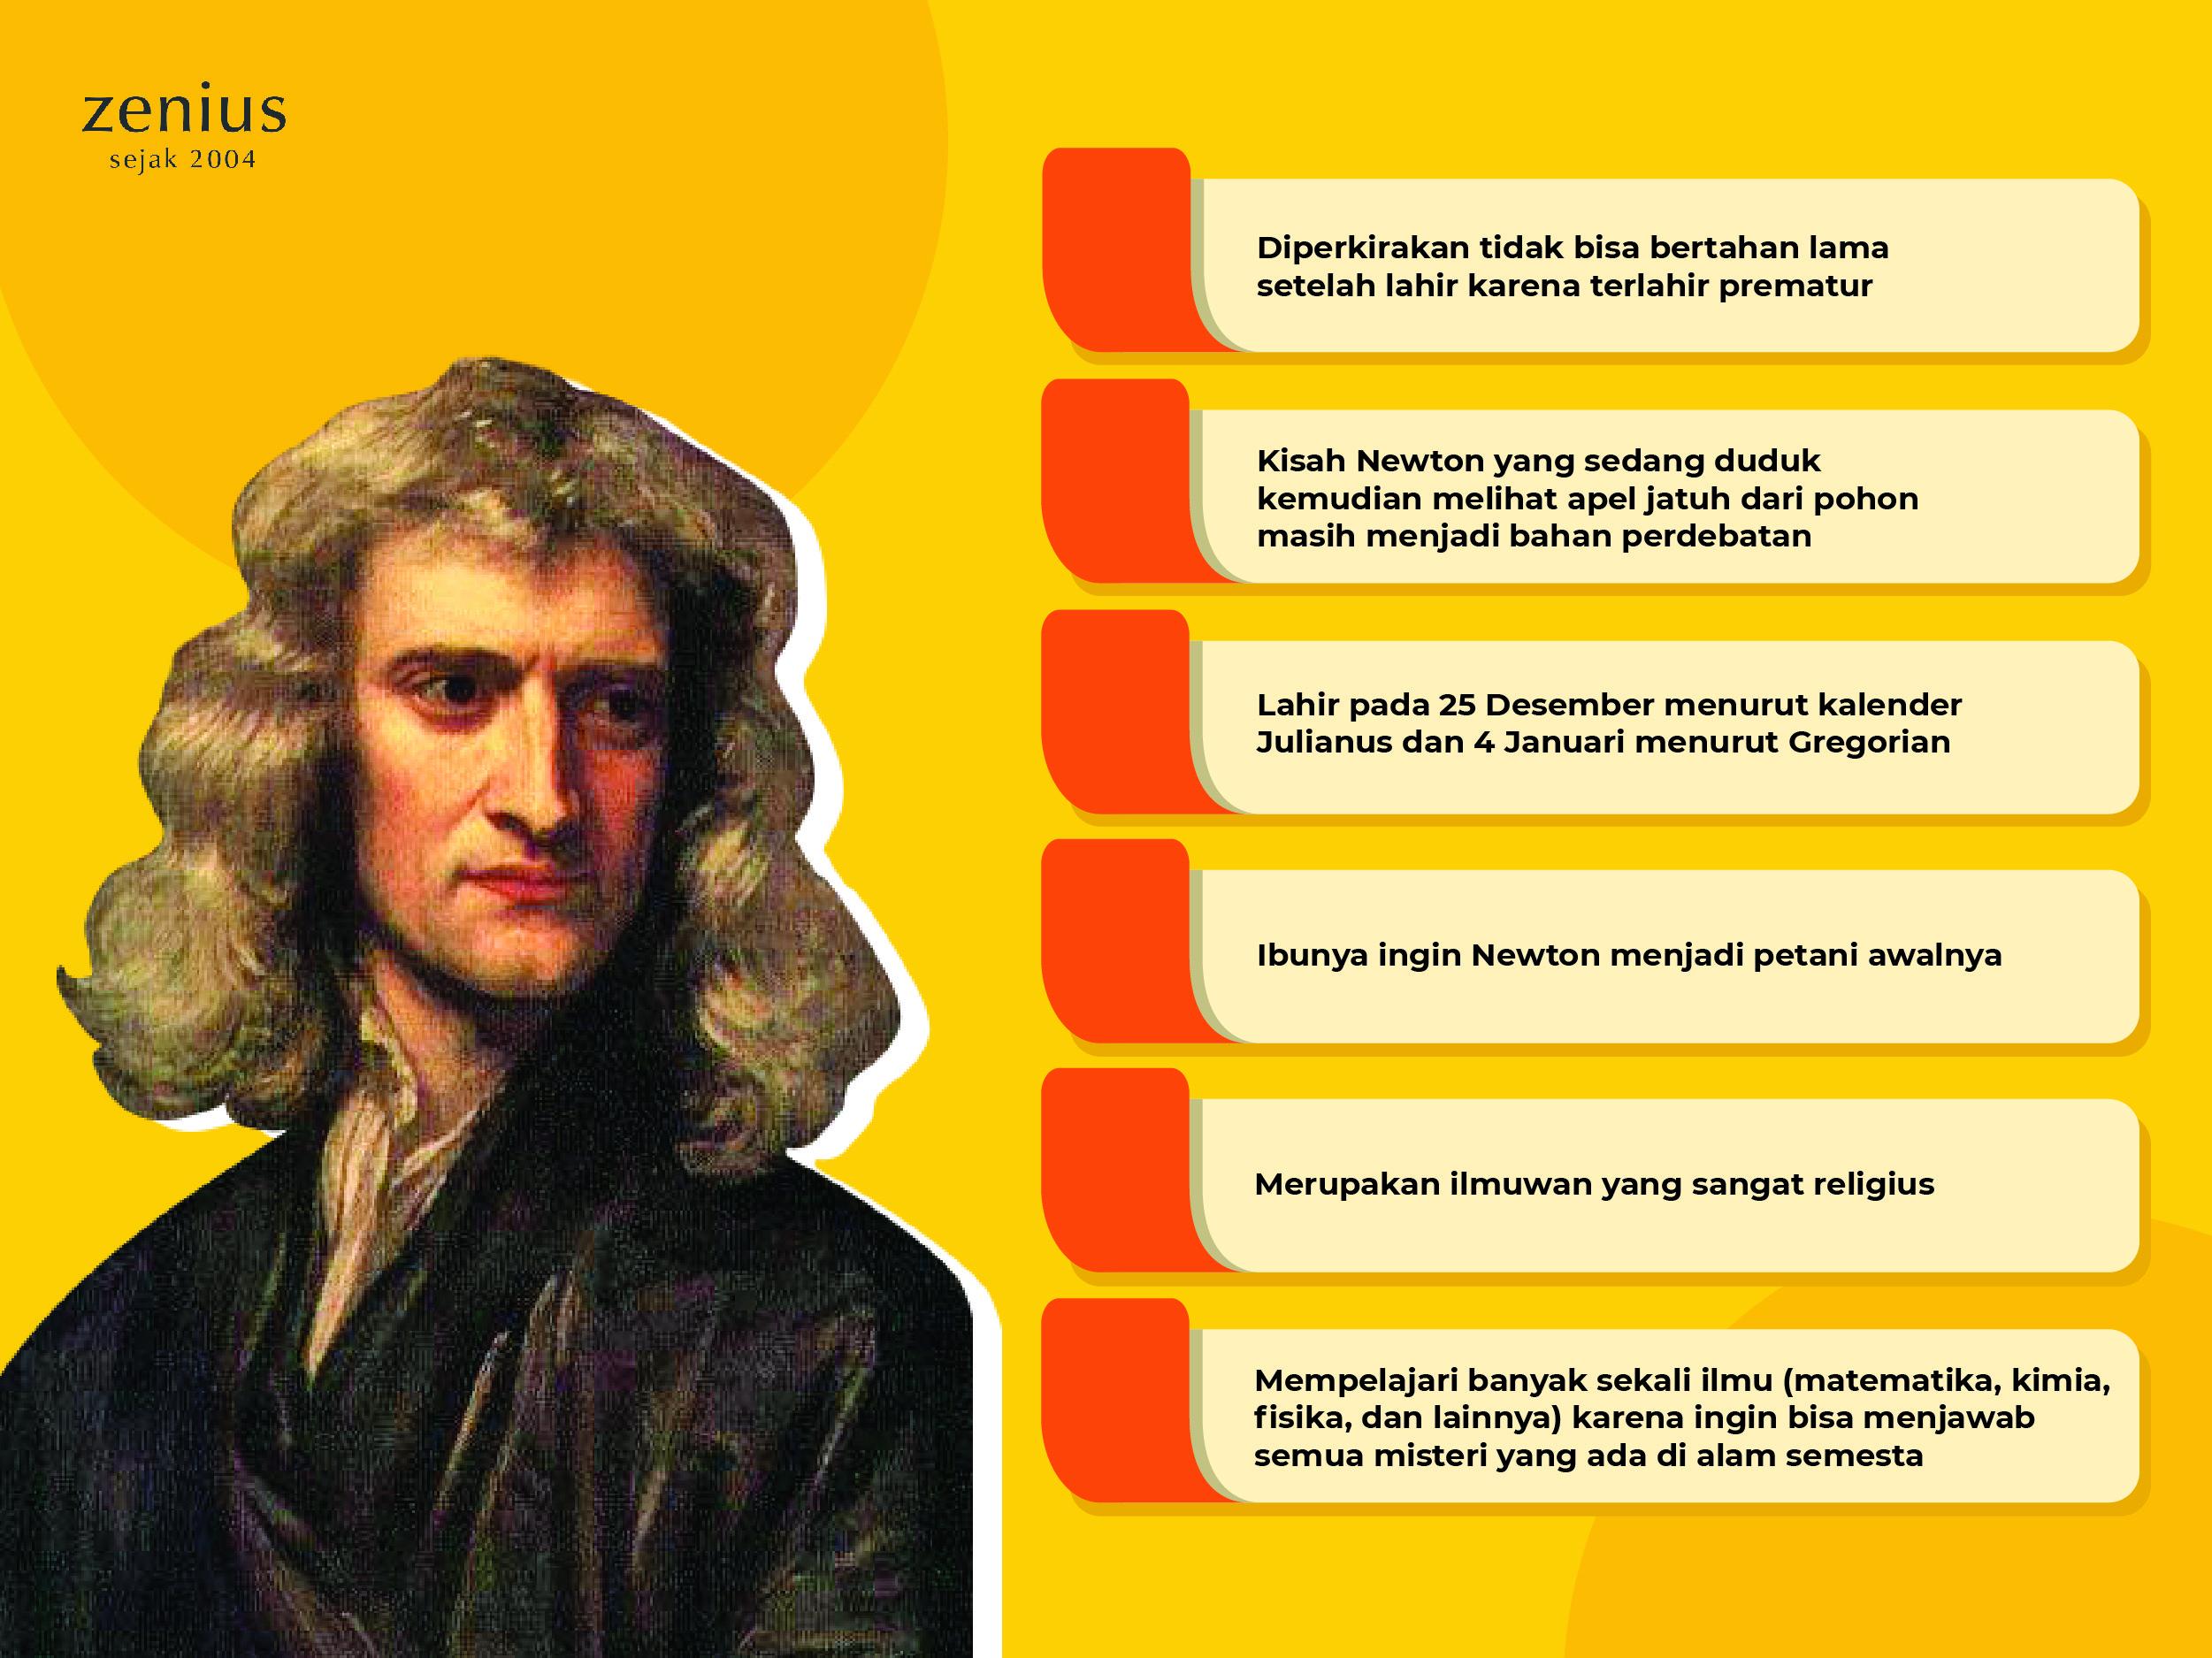 Newton Penemu Teori Gravitasi Hukum Newton 1 2 3 Zenius Nb19